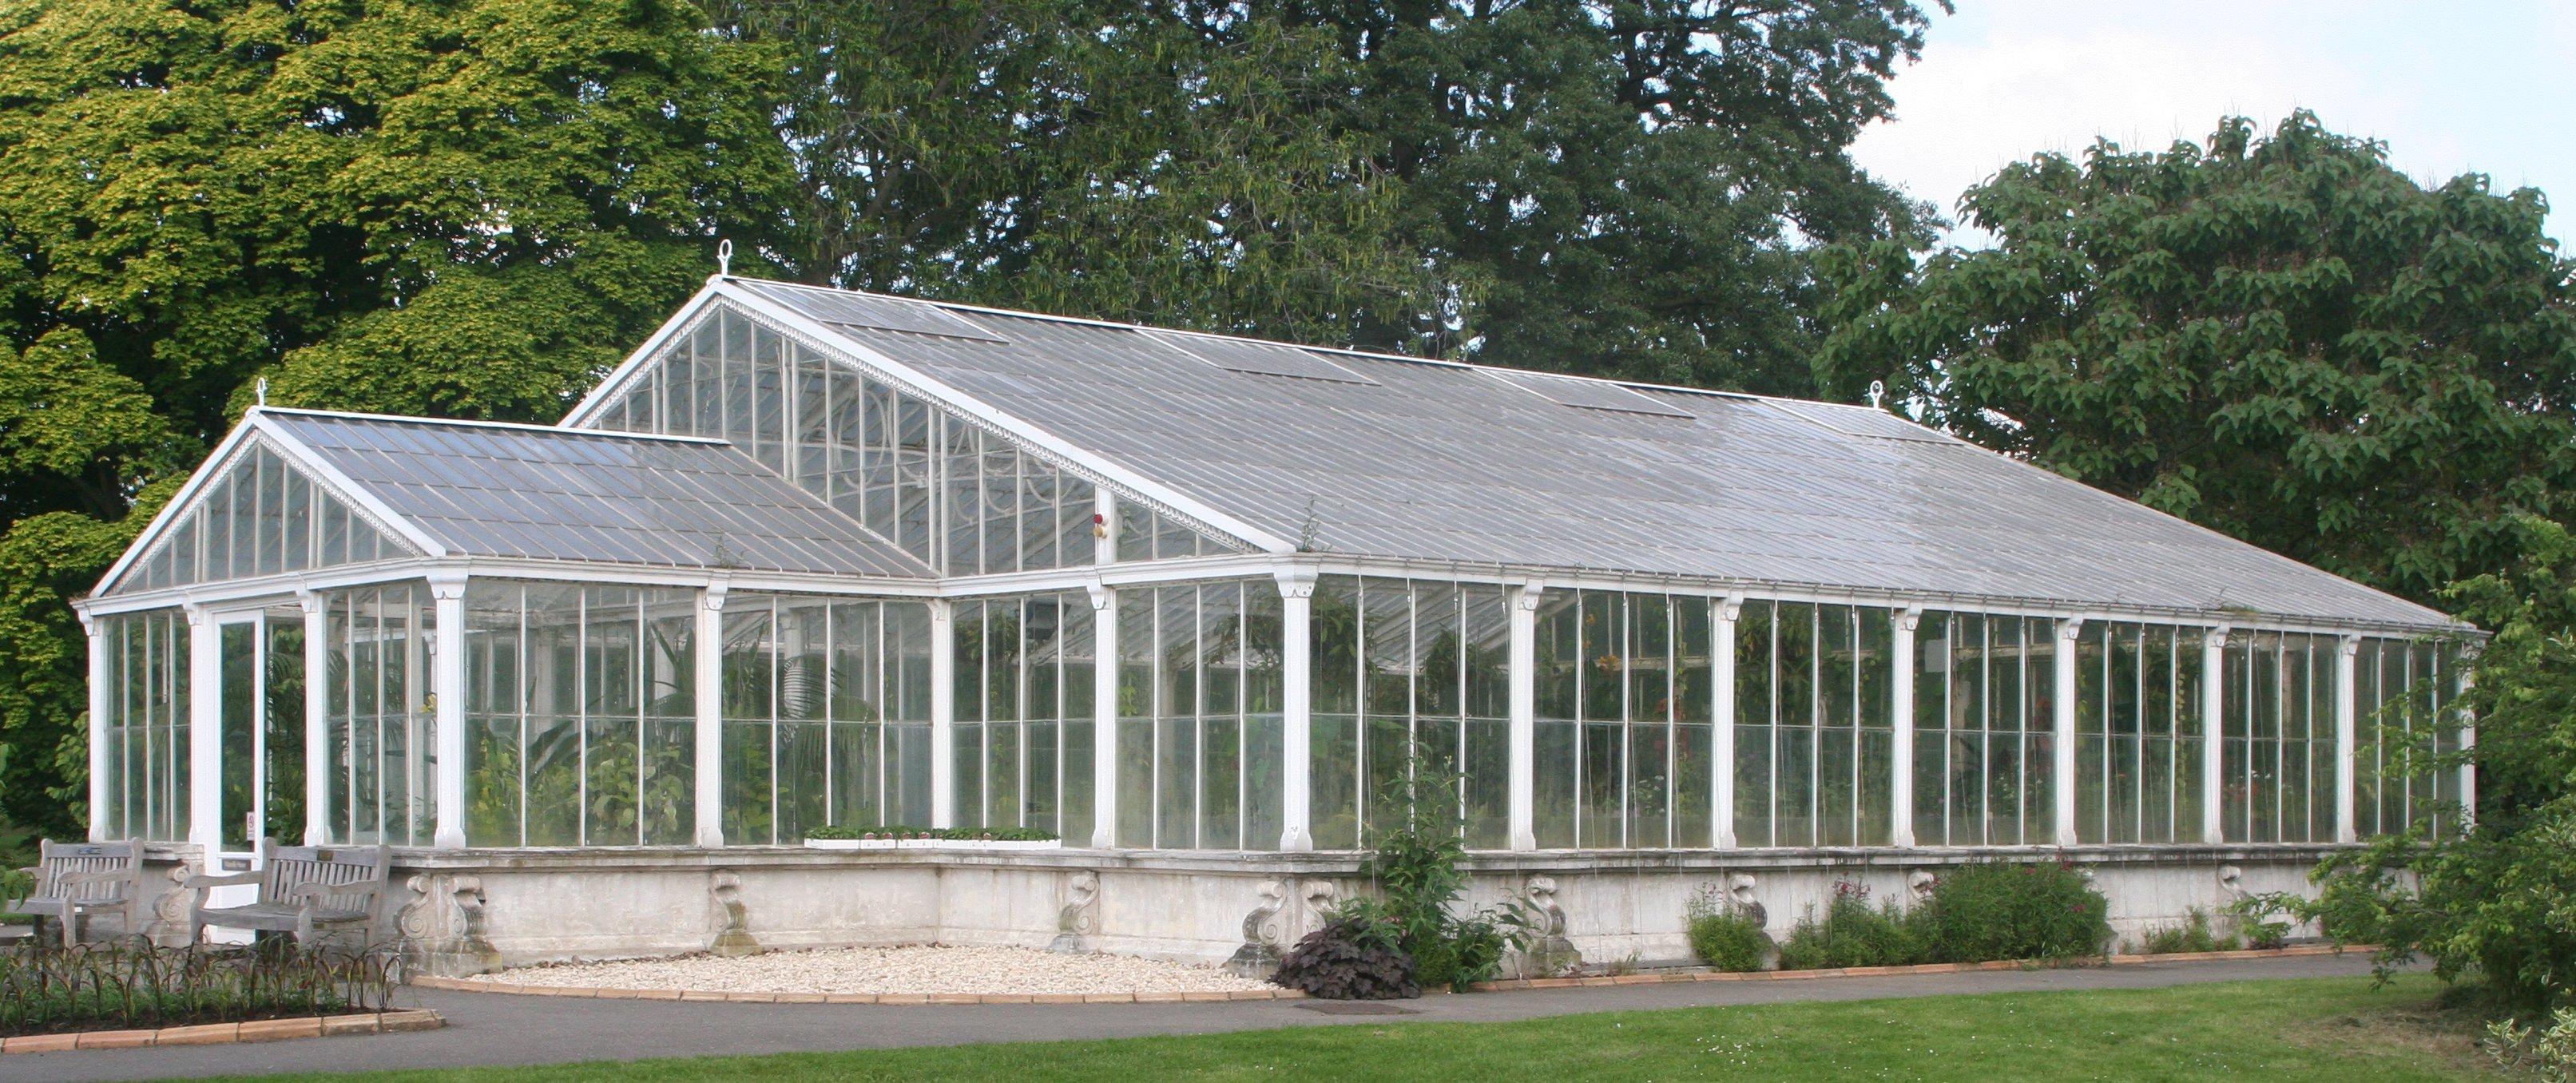 File:Kew Gardens Water Lily House.jpg - Wikimedia Commons